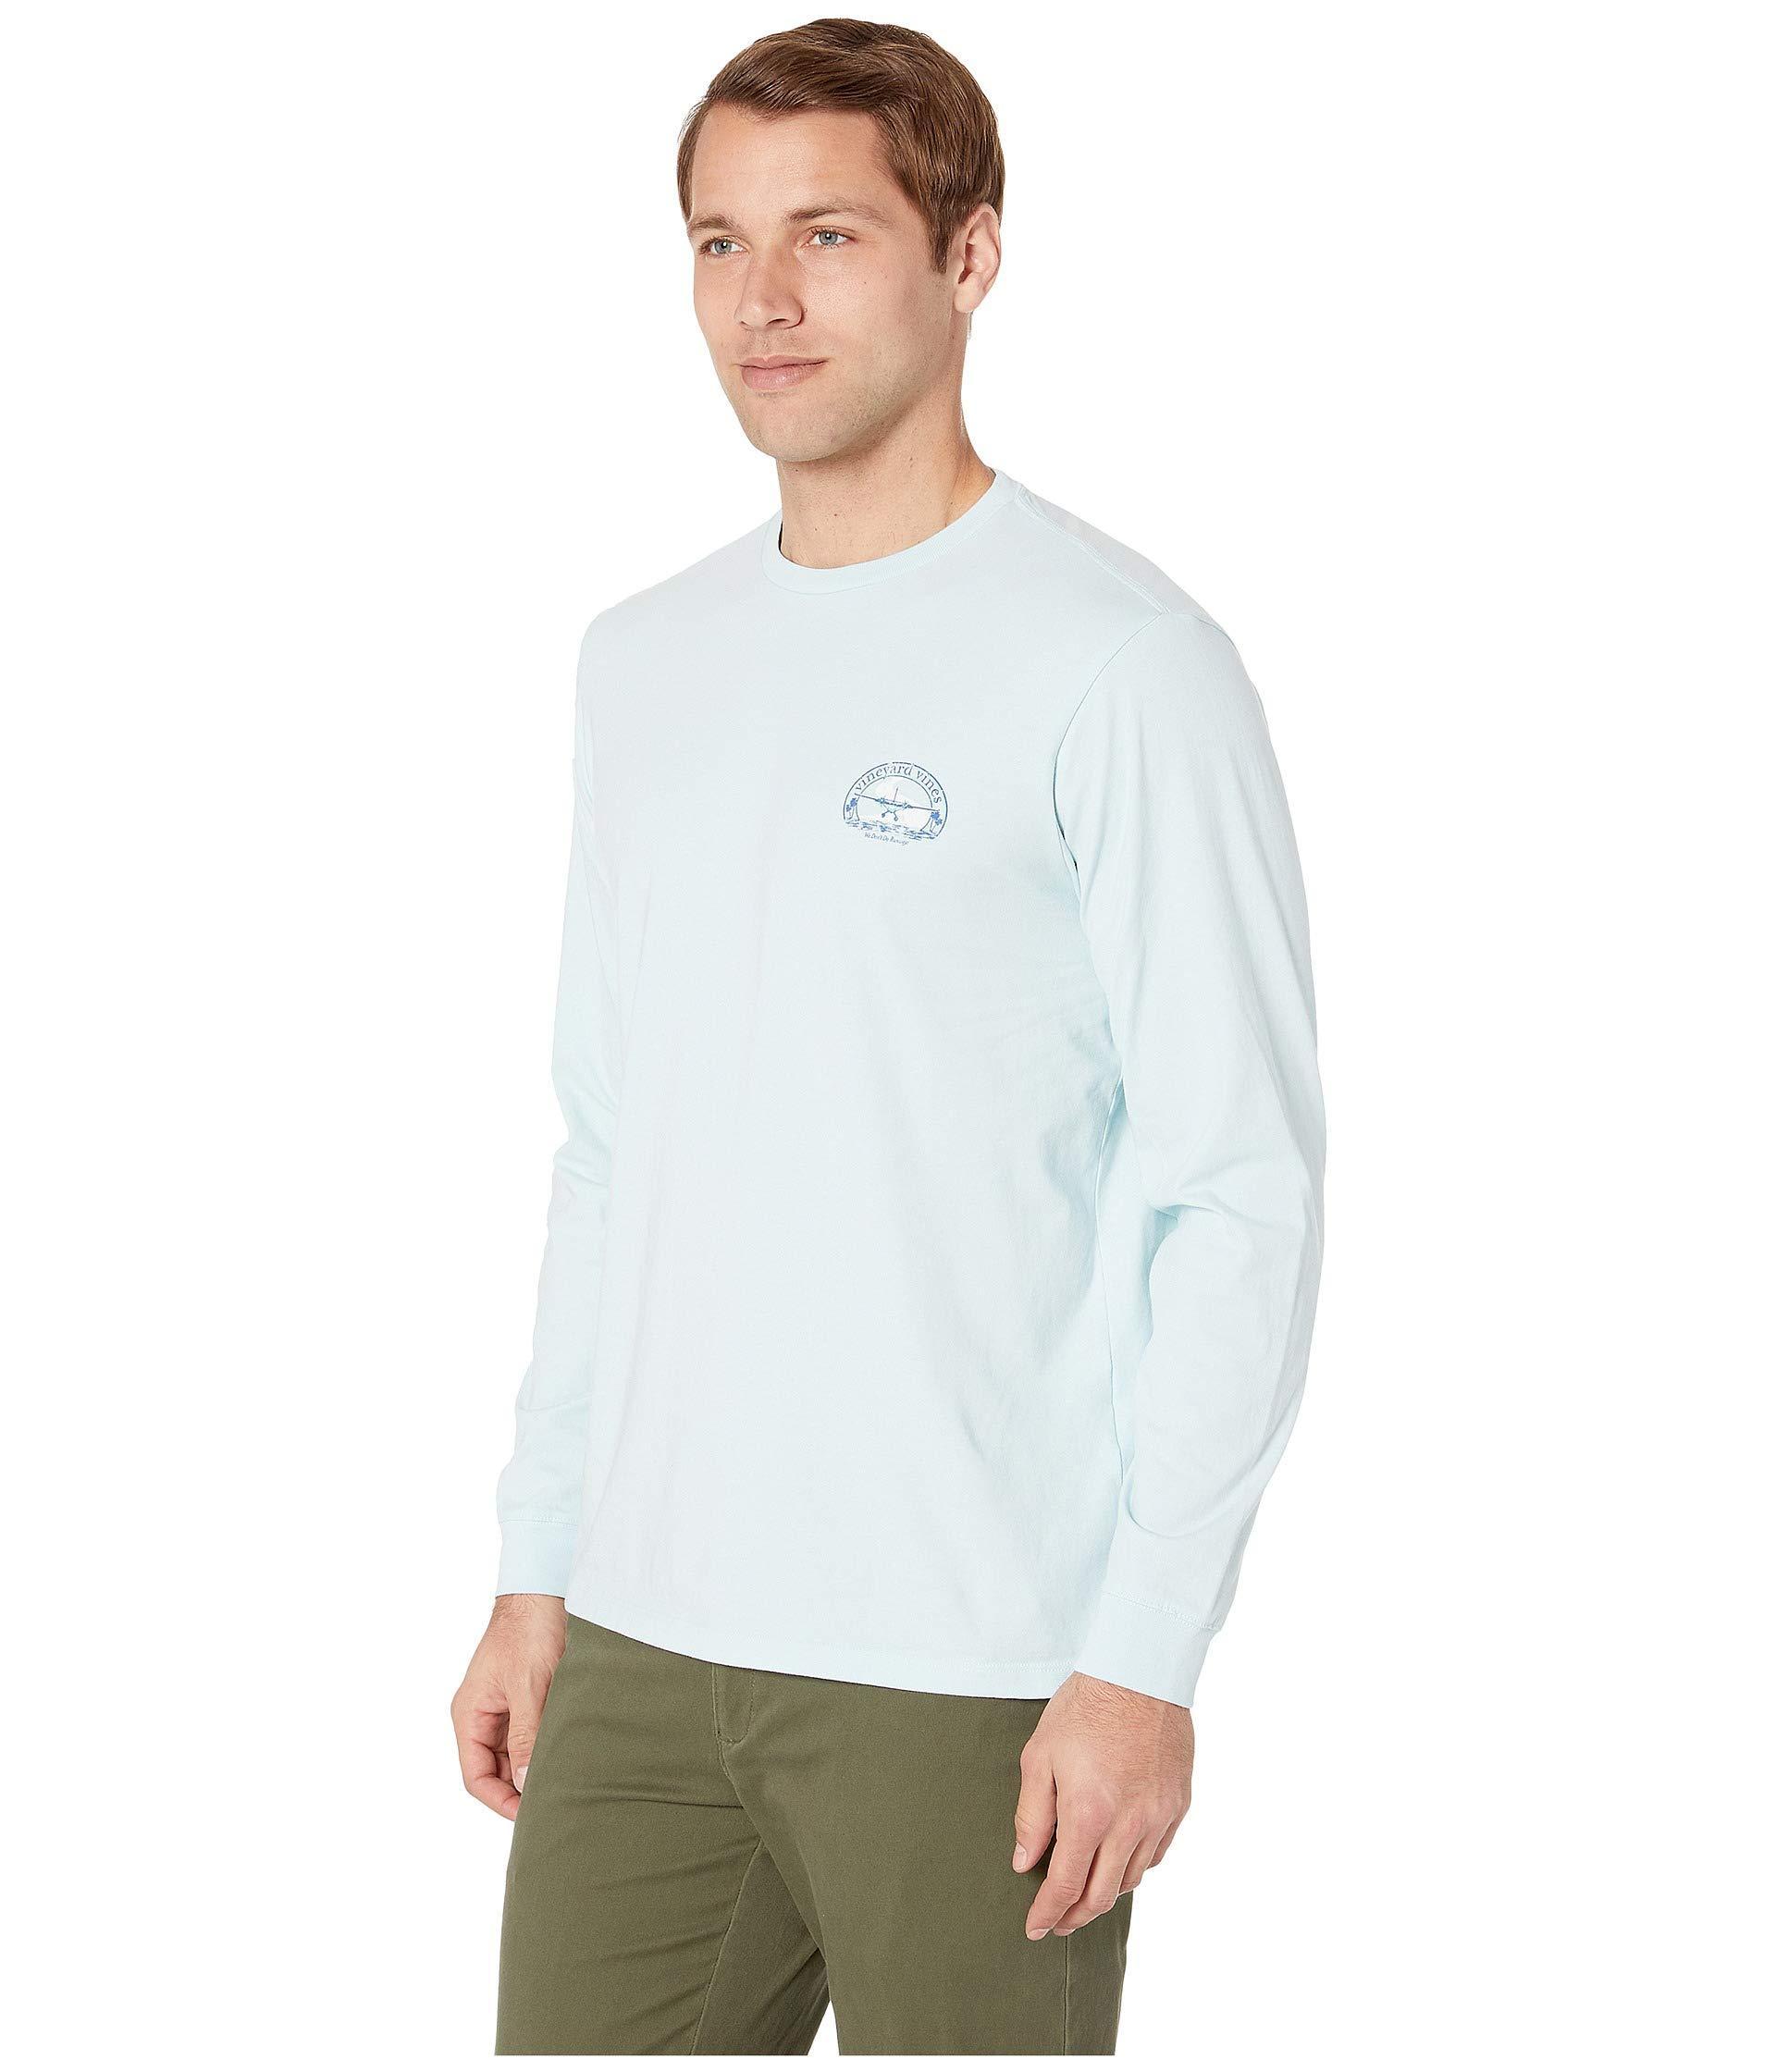 c2dca38c8 Lyst - Vineyard Vines Long Sleeve No Runway Tee (misty Blue) Men's T Shirt  in Blue for Men